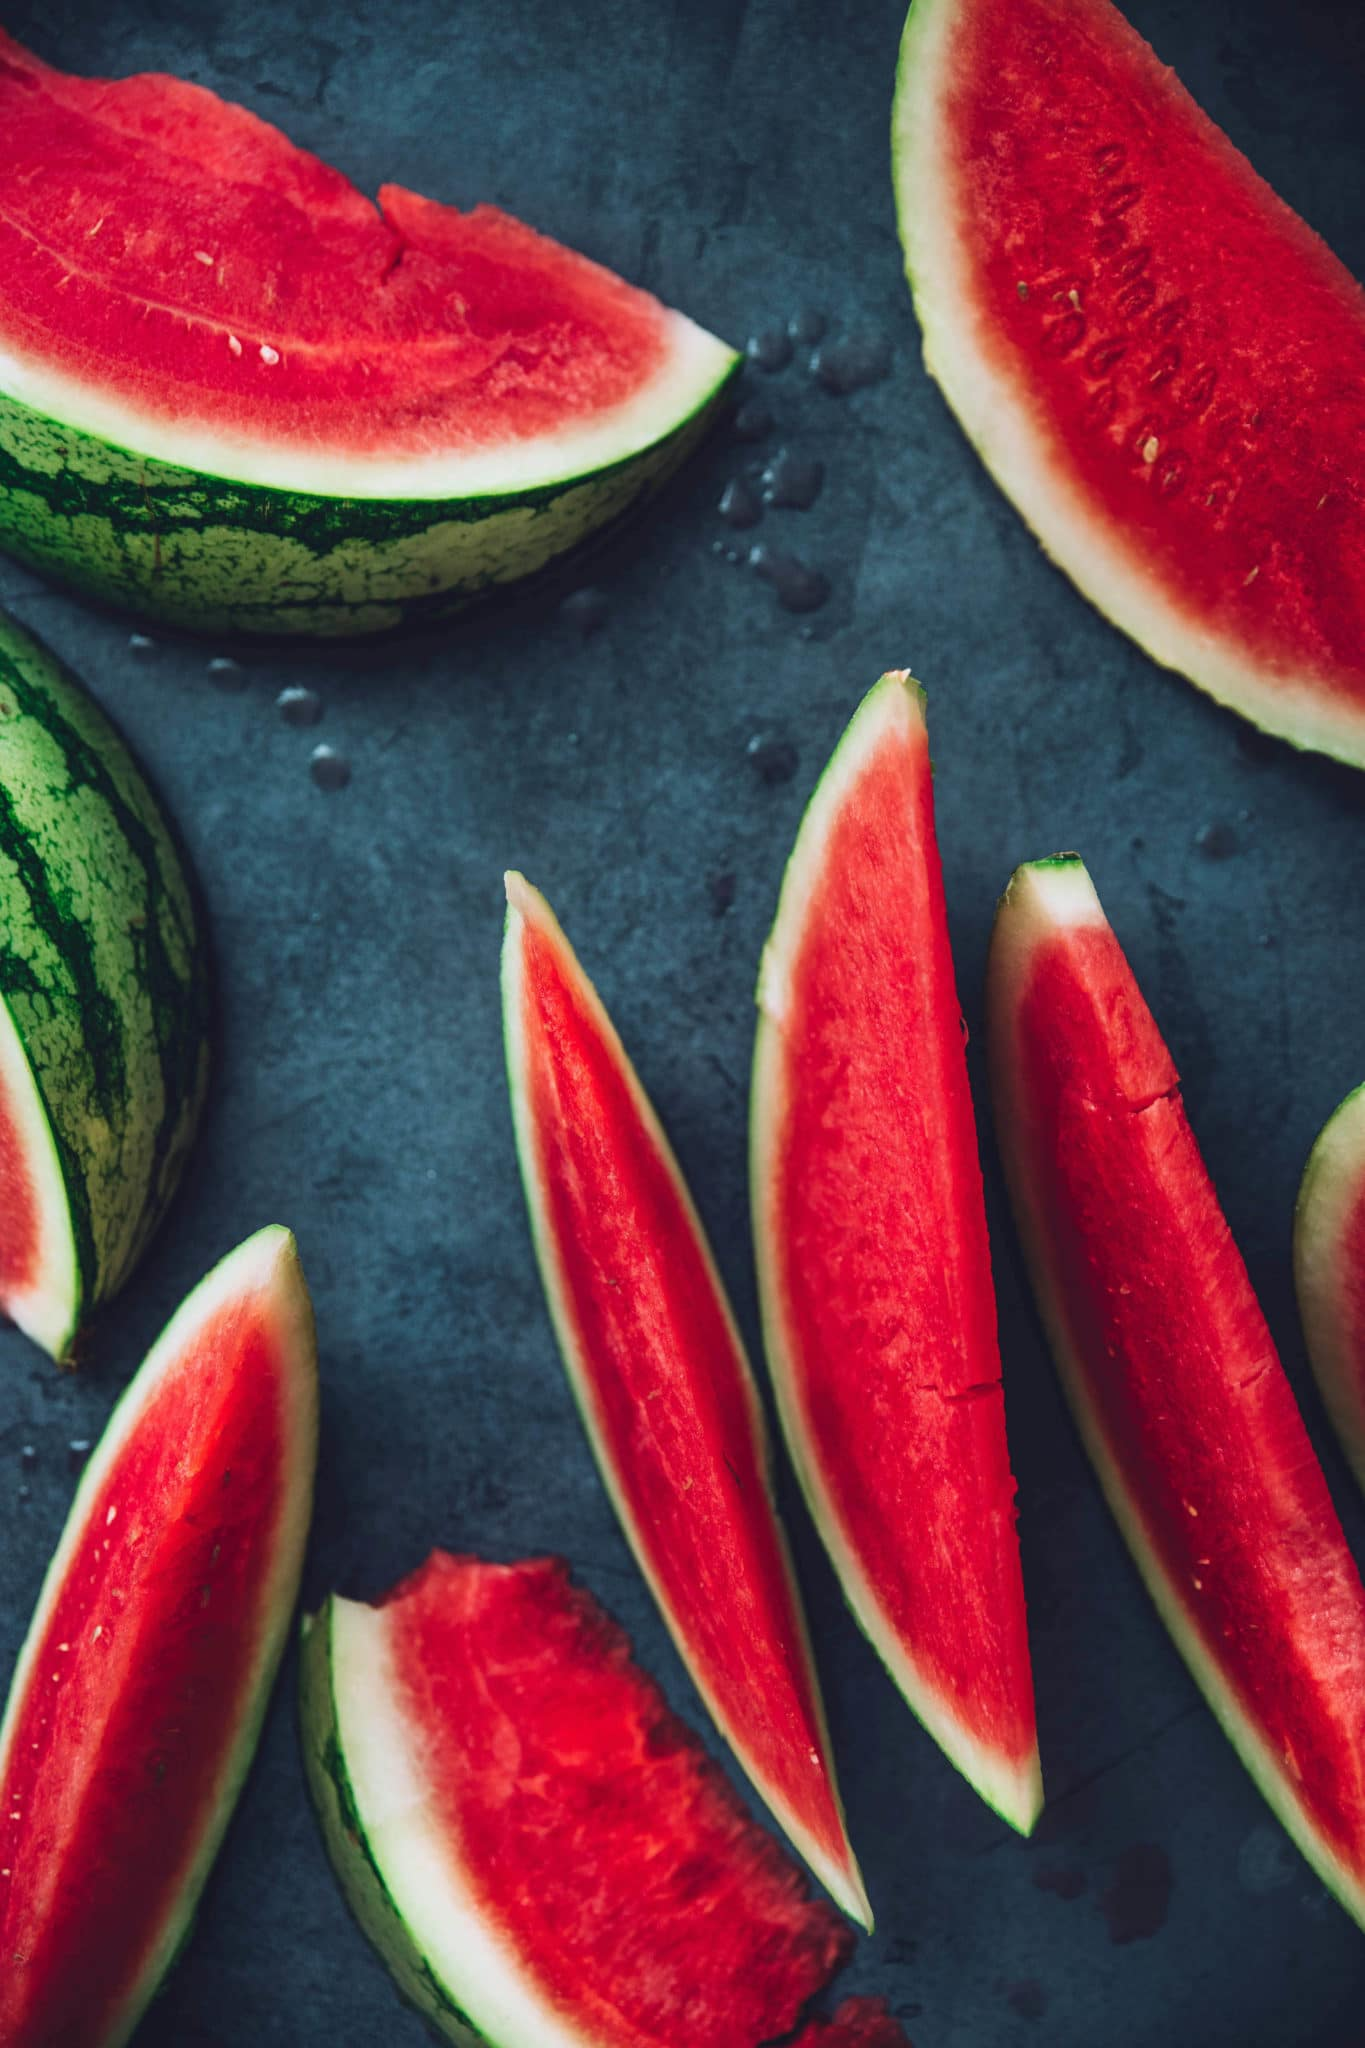 Salade pastèque - Mégane Ardérighi megandcook styliste culinaire lyon